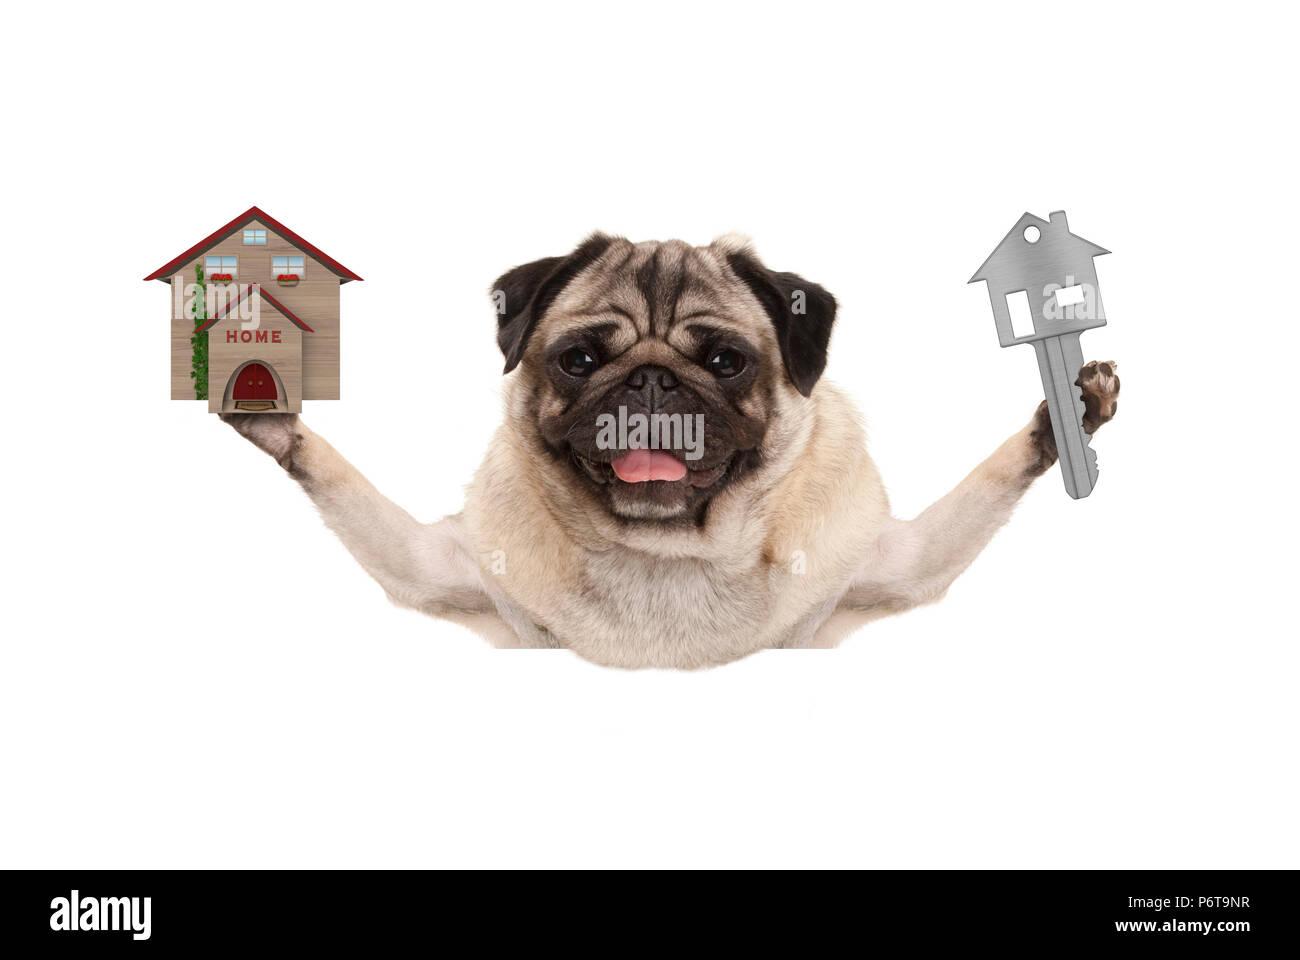 smiling happy pug puppy dog holding up house key and miniature house, isolated on white background Stock Photo